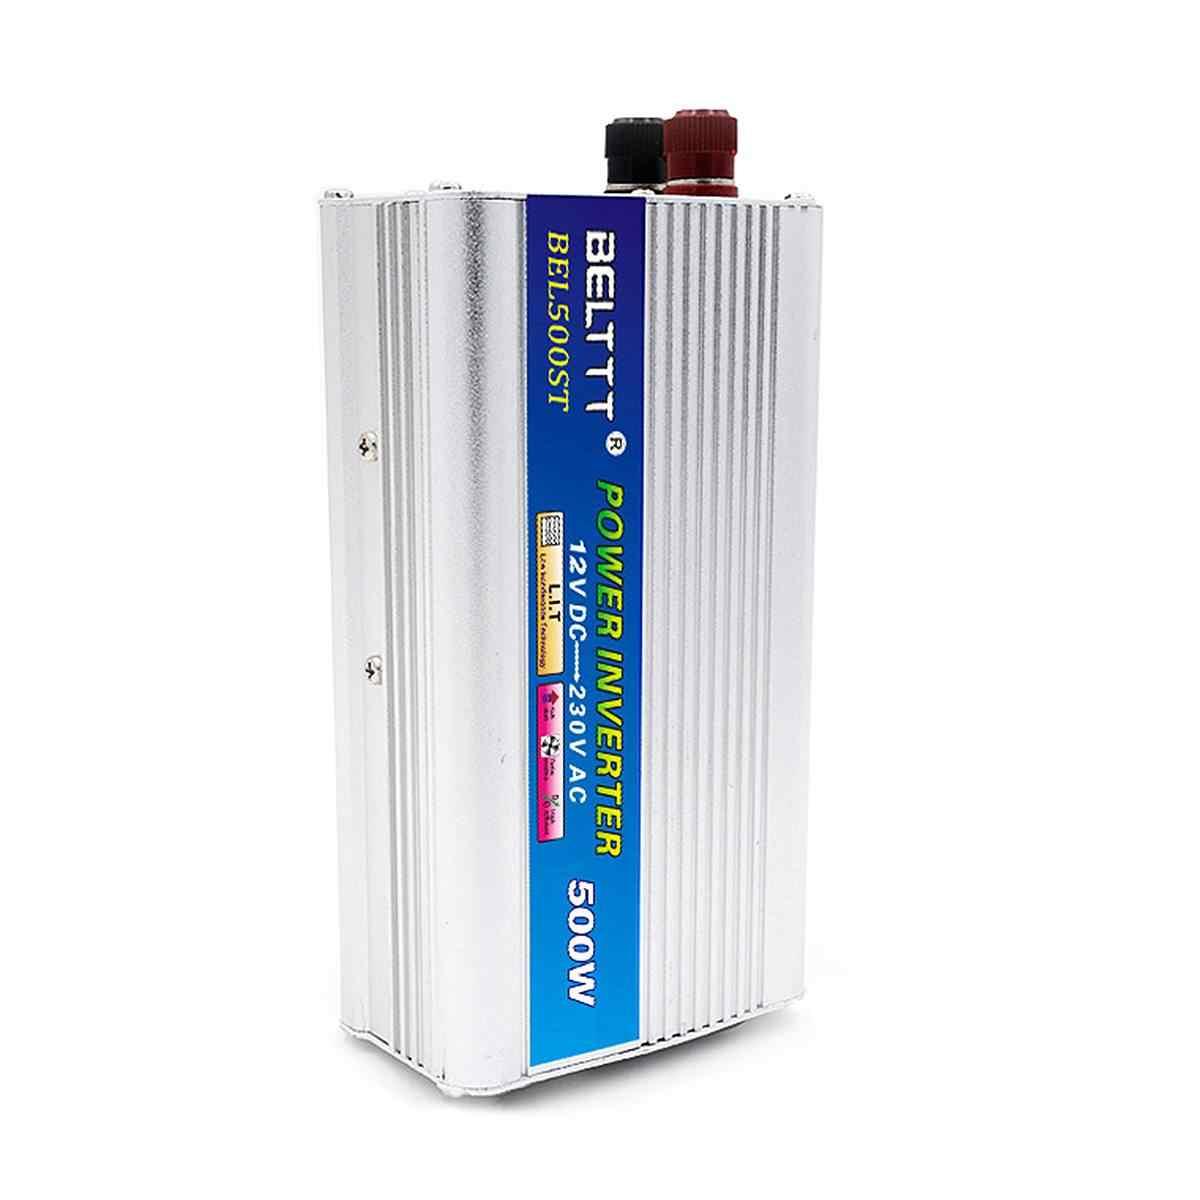 Onduleur solaire 500 W DC 12 V à AC 230 V onduleur de voiture avec convertisseur à onde sinusoïdale modifiée allume-cigare